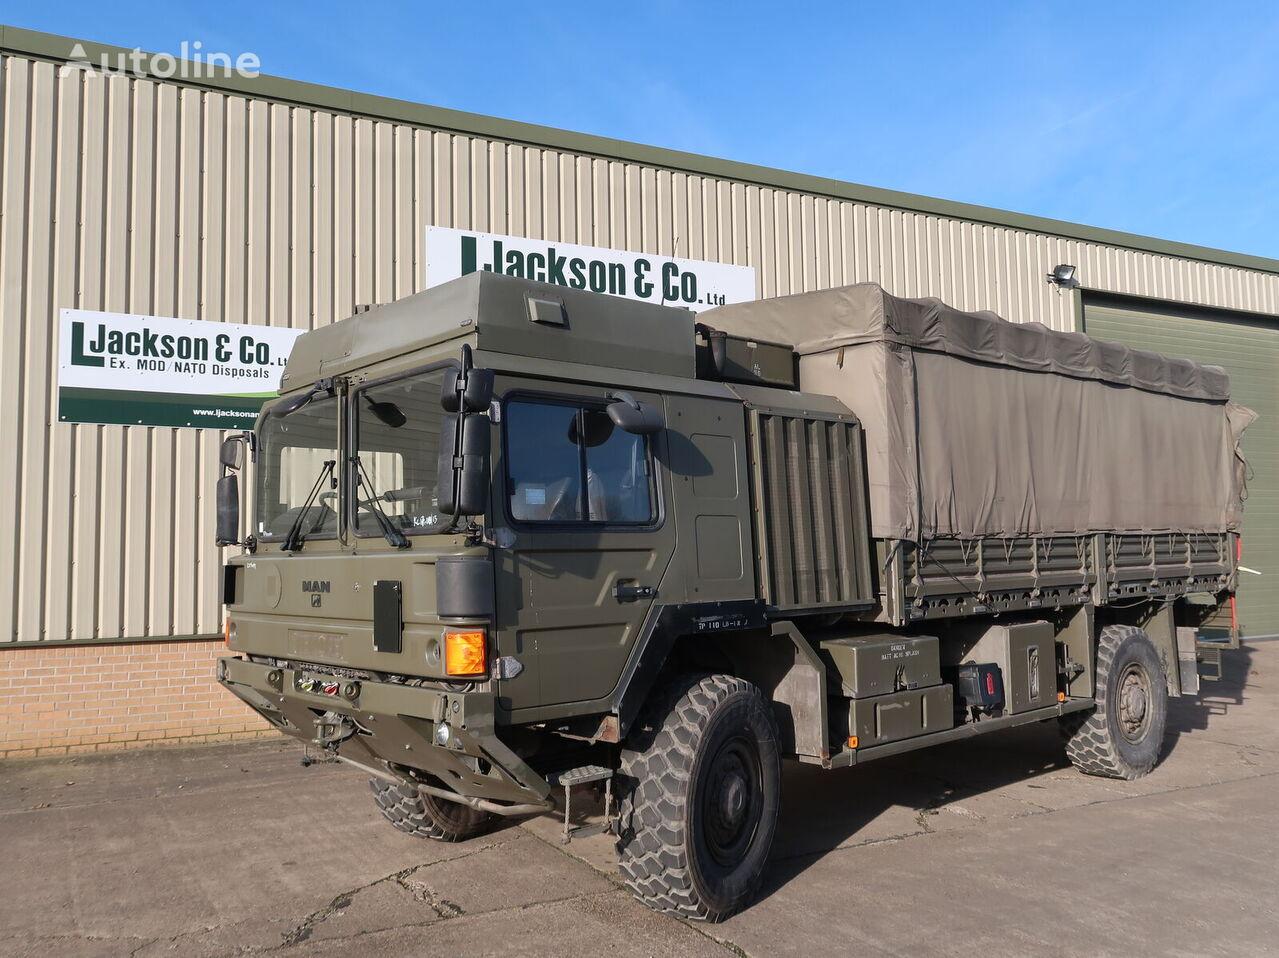 camion militare MAN HX60 18.330 4x4 Army Truck